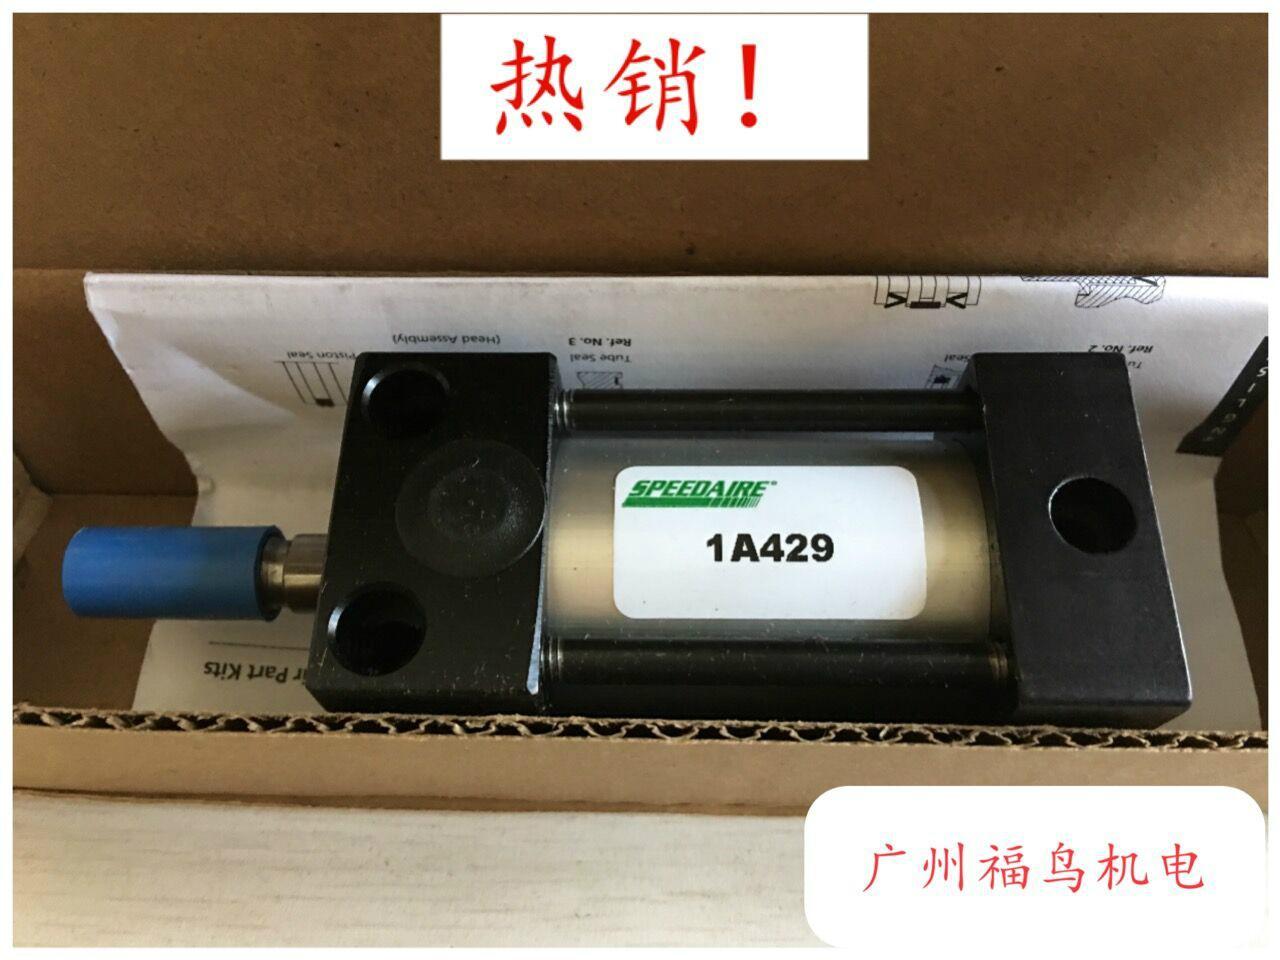 SPEEDAIRE气缸, 型号: 1A429